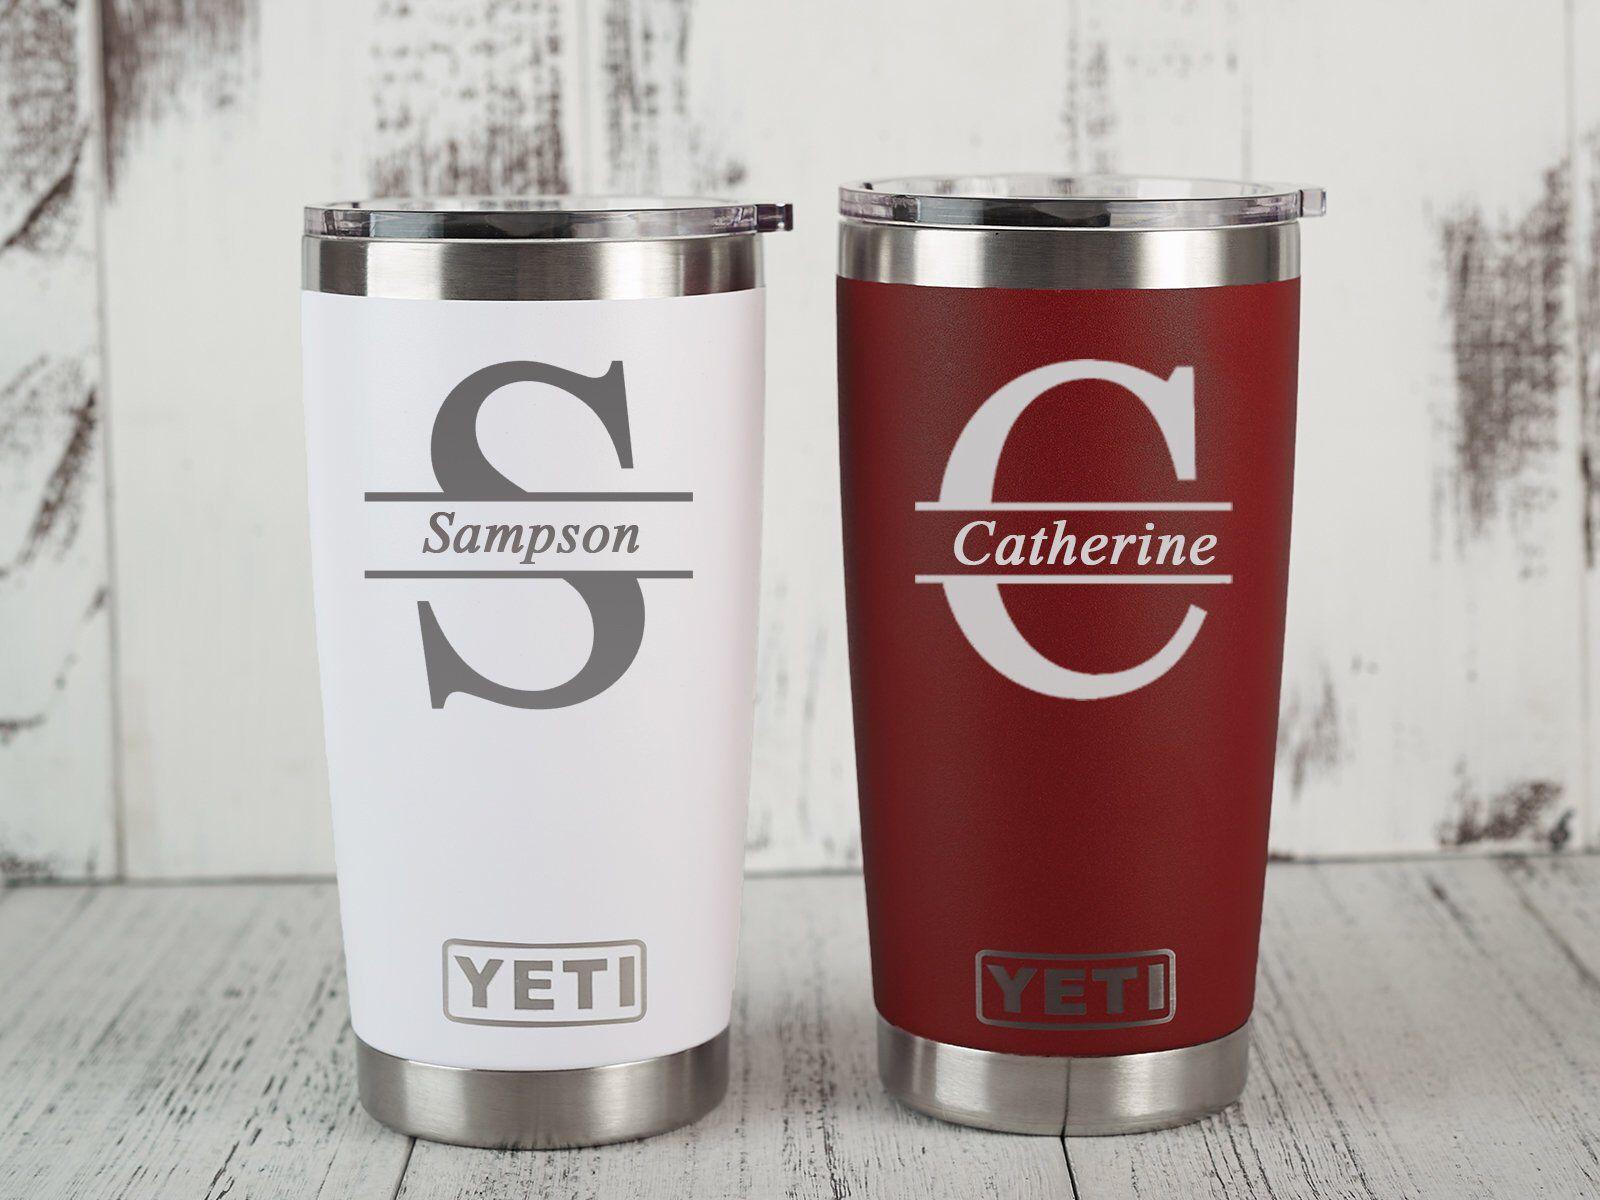 776082d3d36 Yeti Cup Personalized Yeti Tumbler Custom Yeti Rambler Insulated Yeti Cup  Monogrammed Yeti Rambler 20 oz Yeti Cup Custom Yeti Tumbler 30 oz